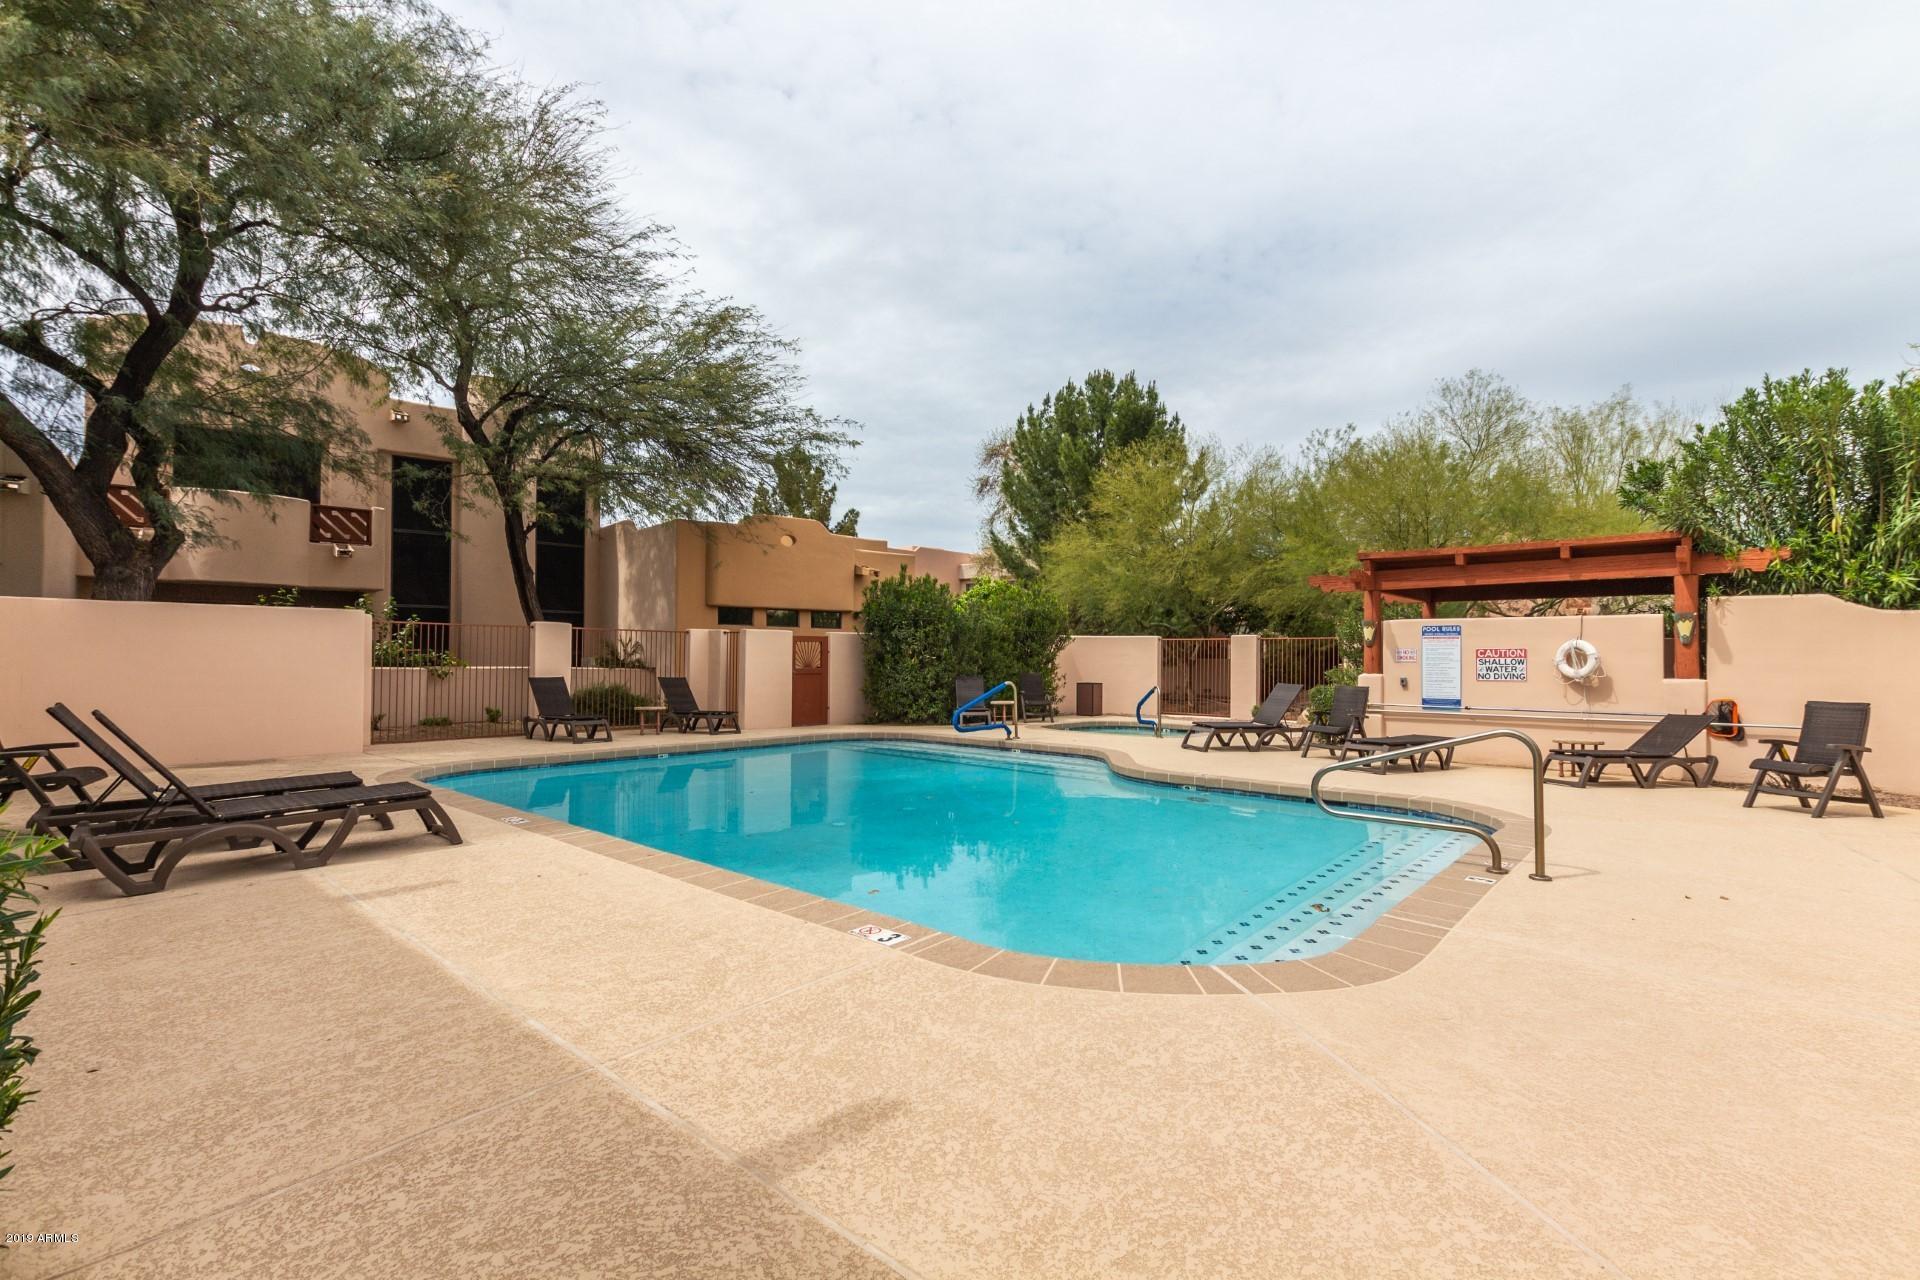 MLS 5896263 333 N PENNINGTON Drive Unit 21, Chandler, AZ 85224 Chandler AZ Andersen Springs